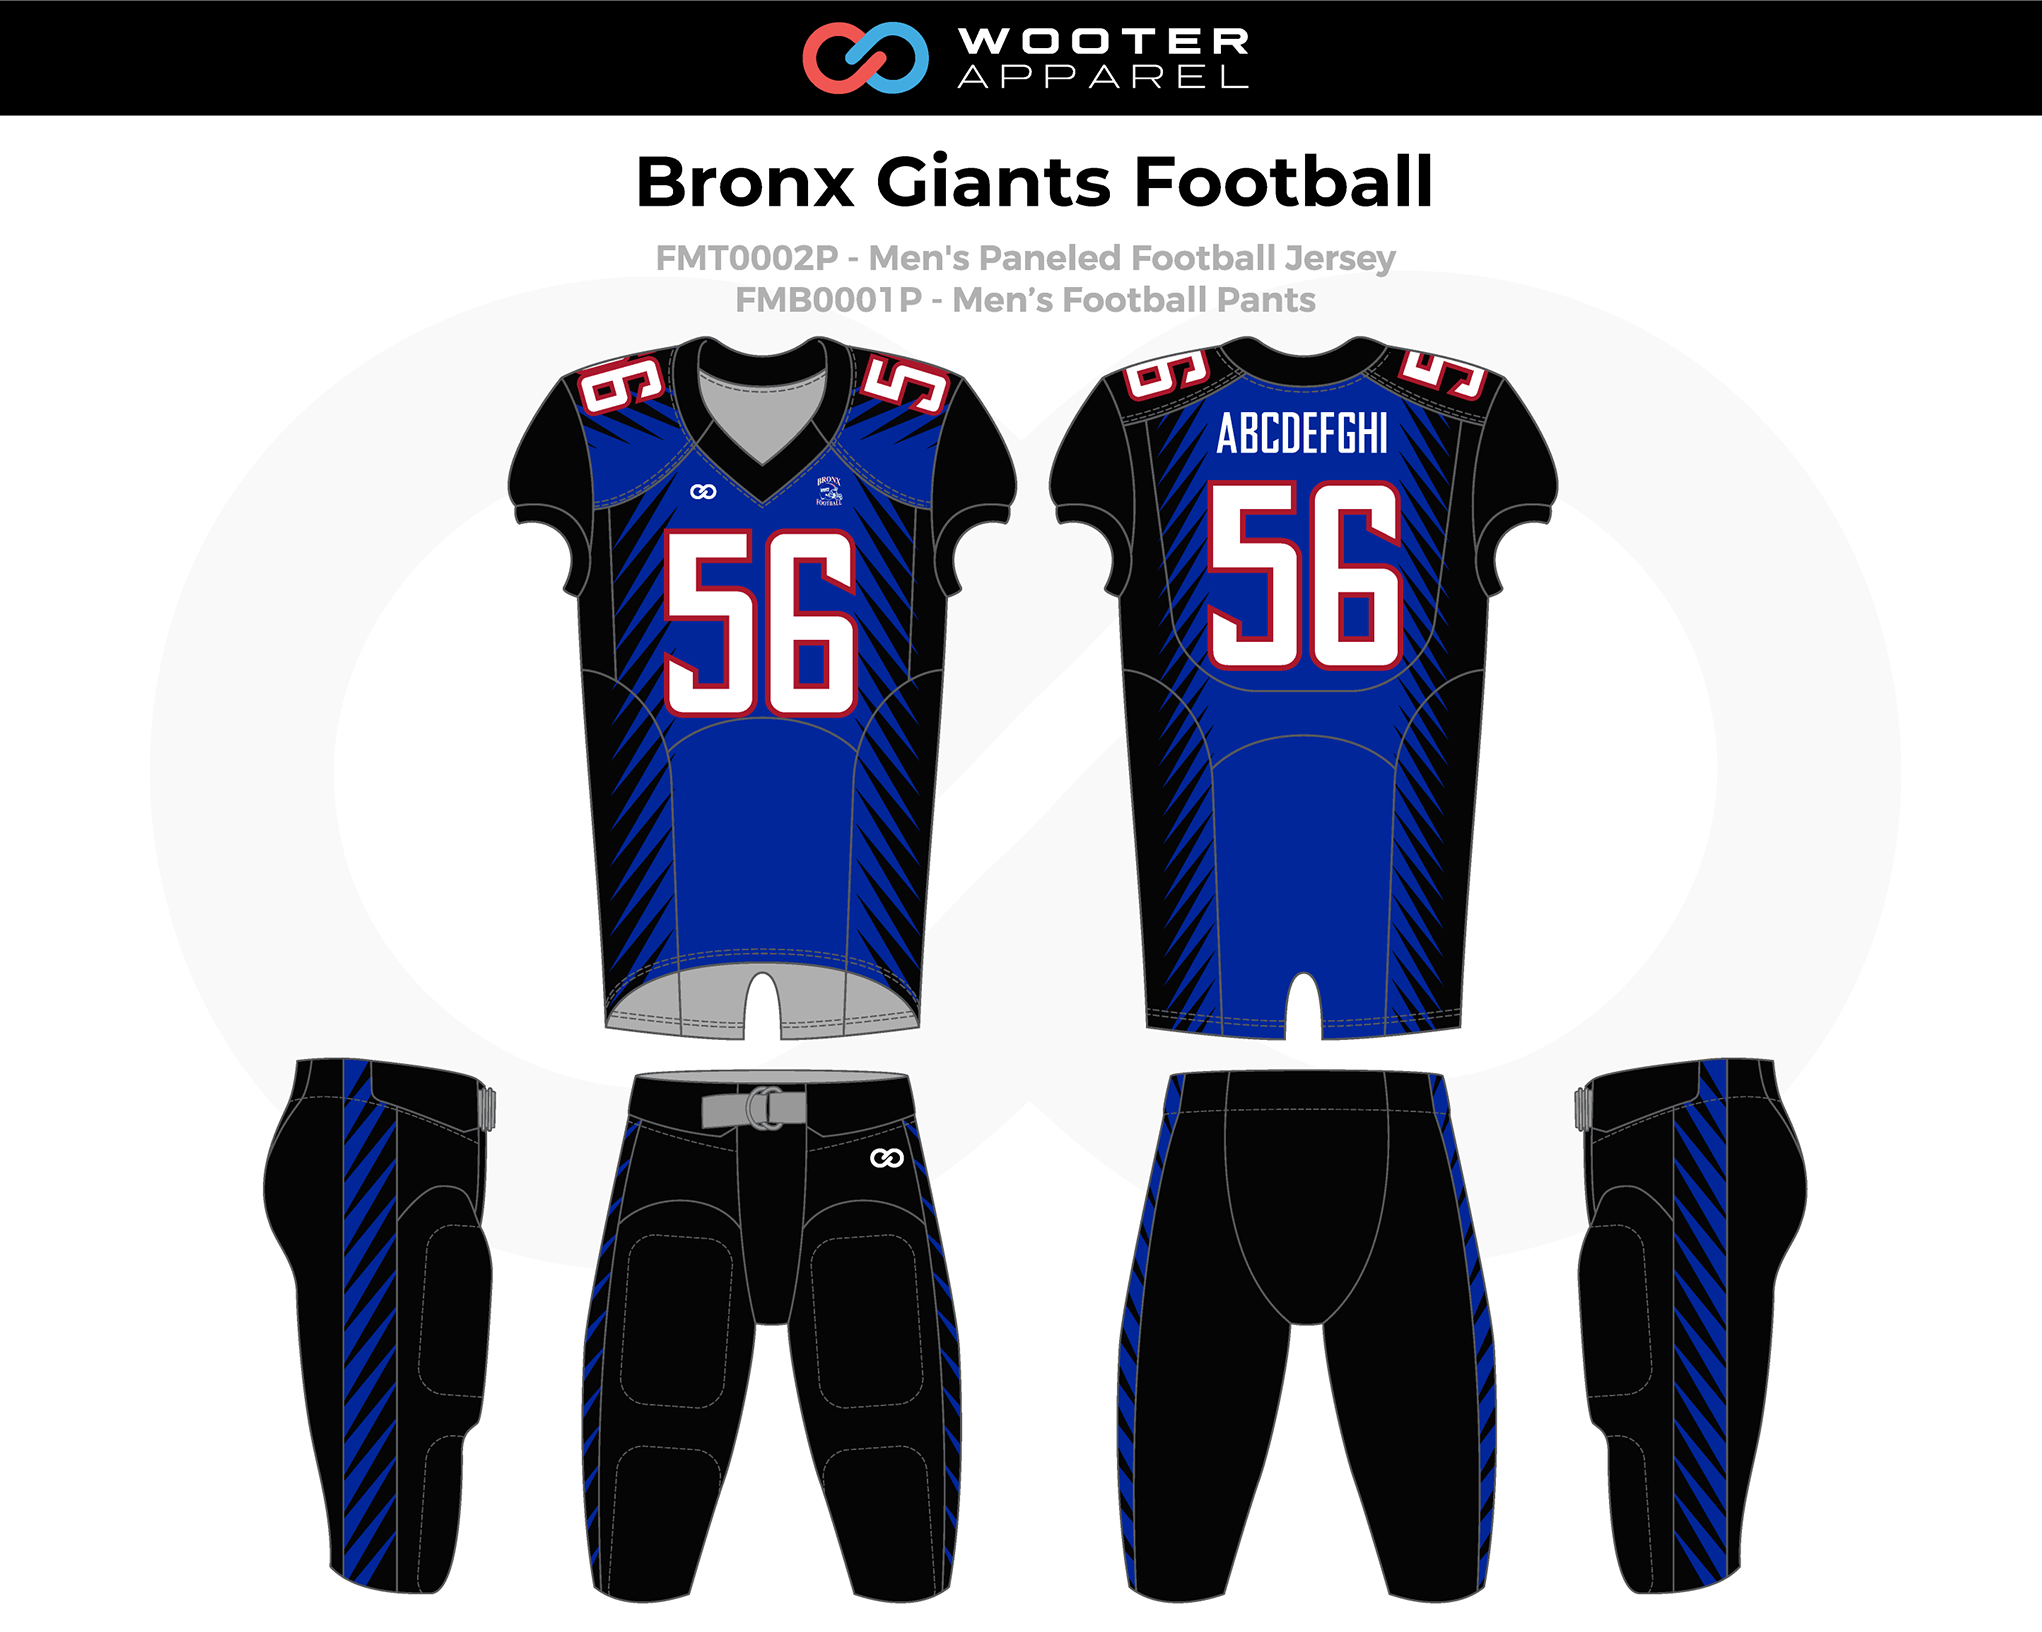 BRONX GIANTS Blue Black White Football Uniforms, Jerseys, and Pants